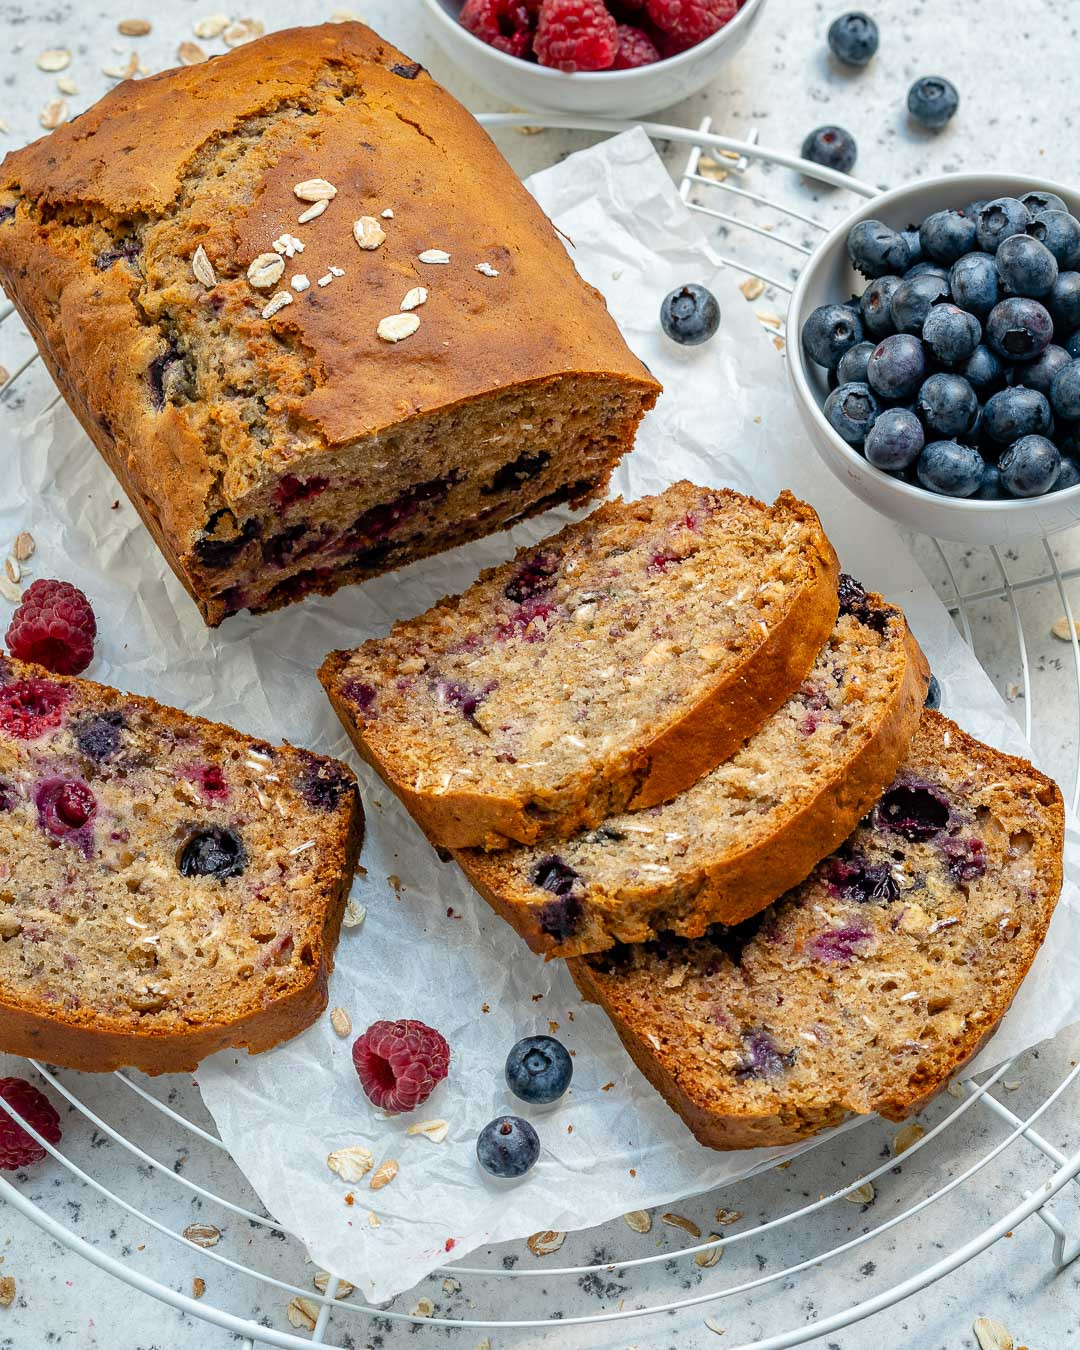 Healthy Oatmeal Bread Recipe  Healthy Blueberry Oatmeal Bread Recipe